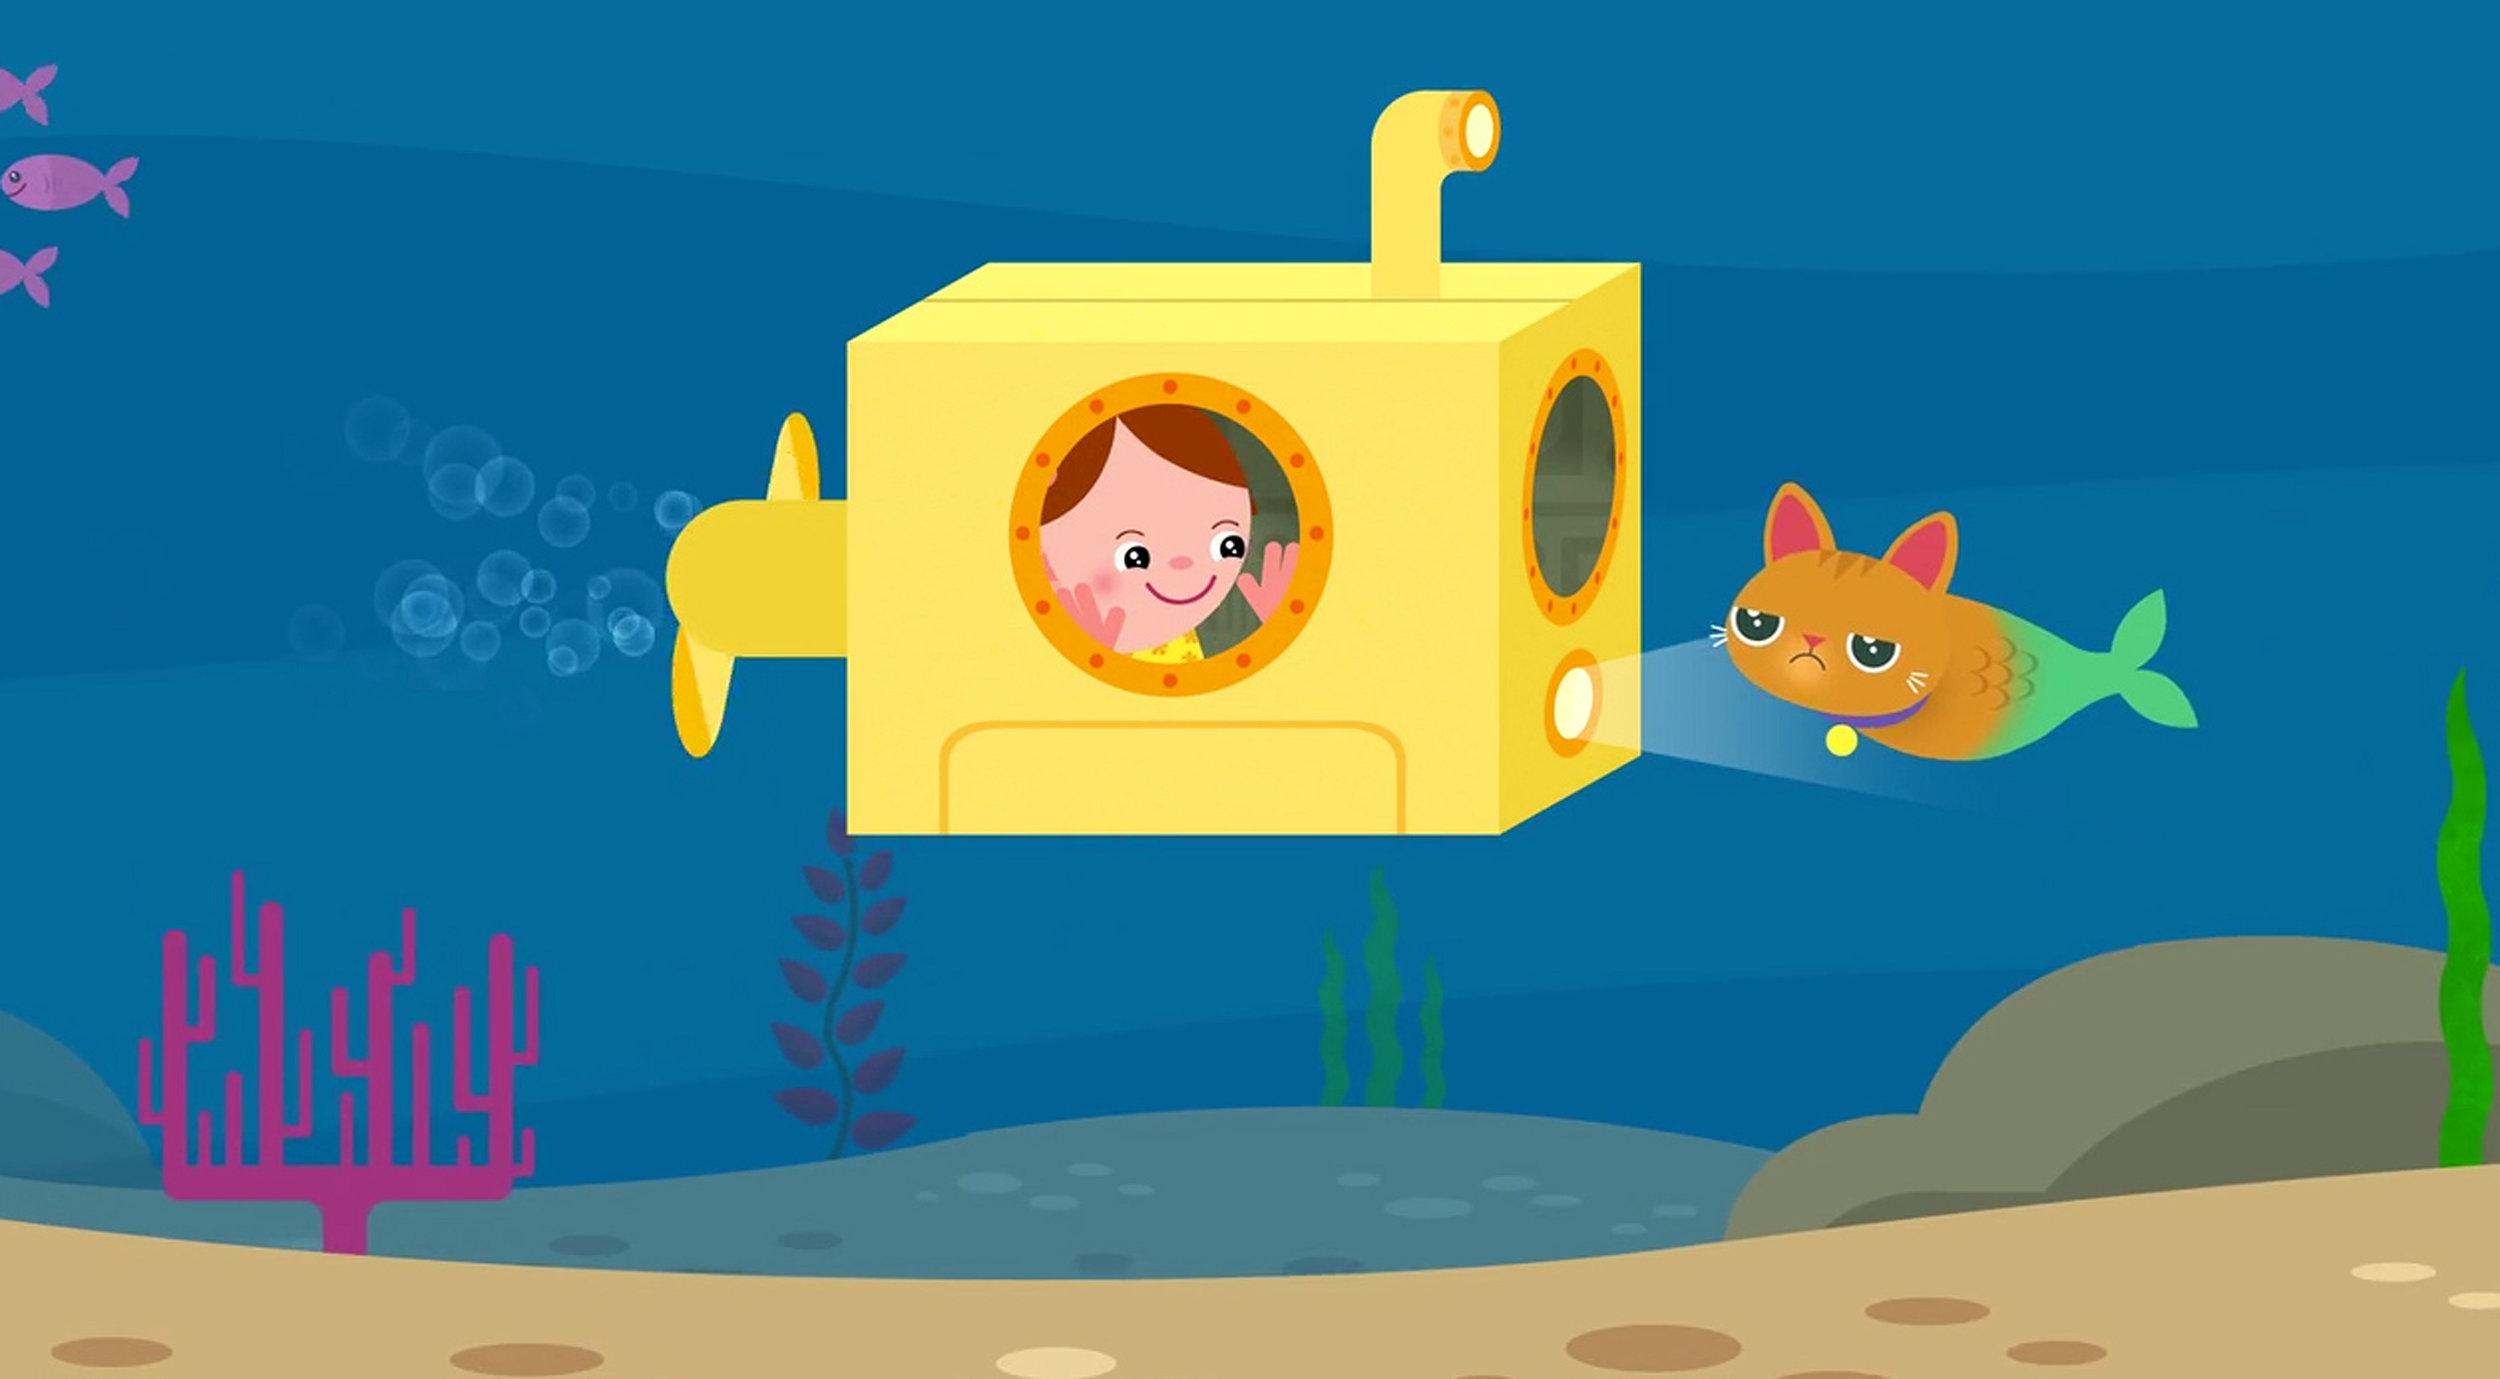 Submarine Milly.jpg